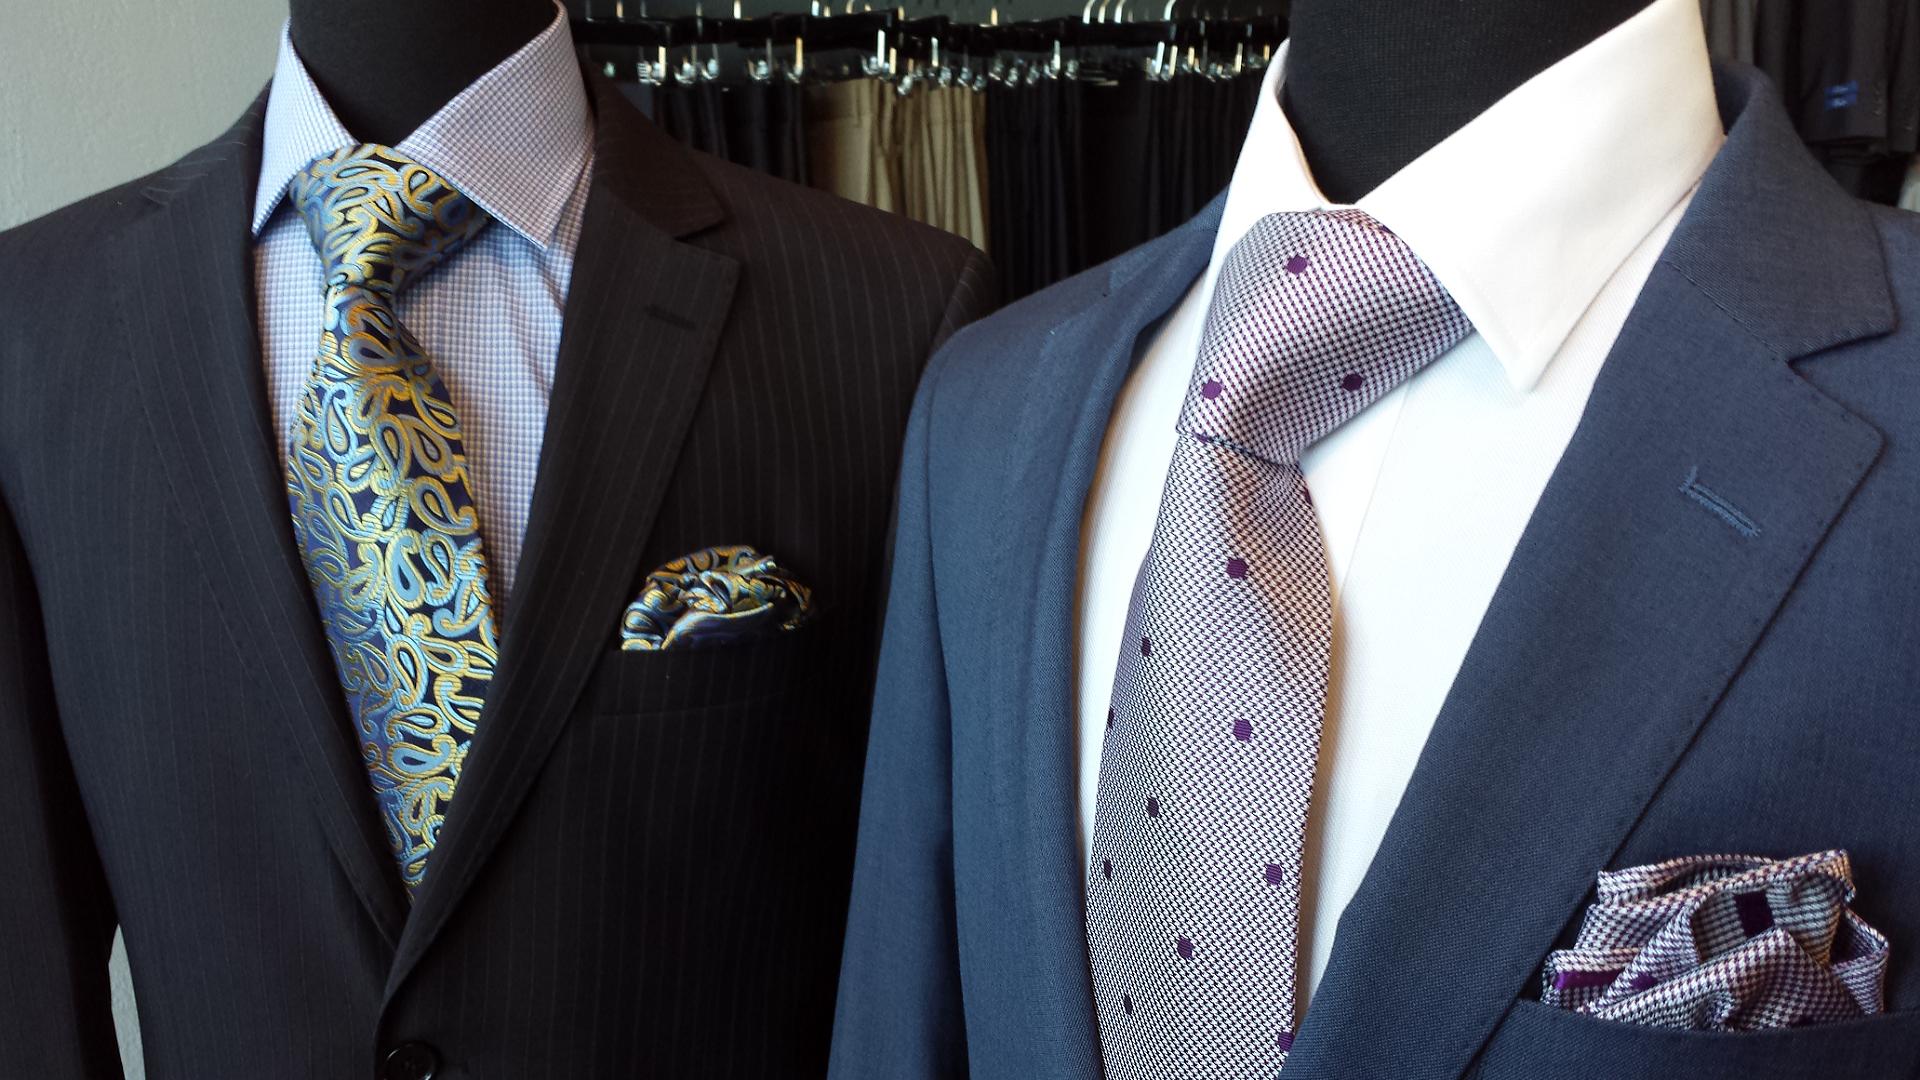 Tuxedo Rentals + Shops in Kansas City, MO - The Knot